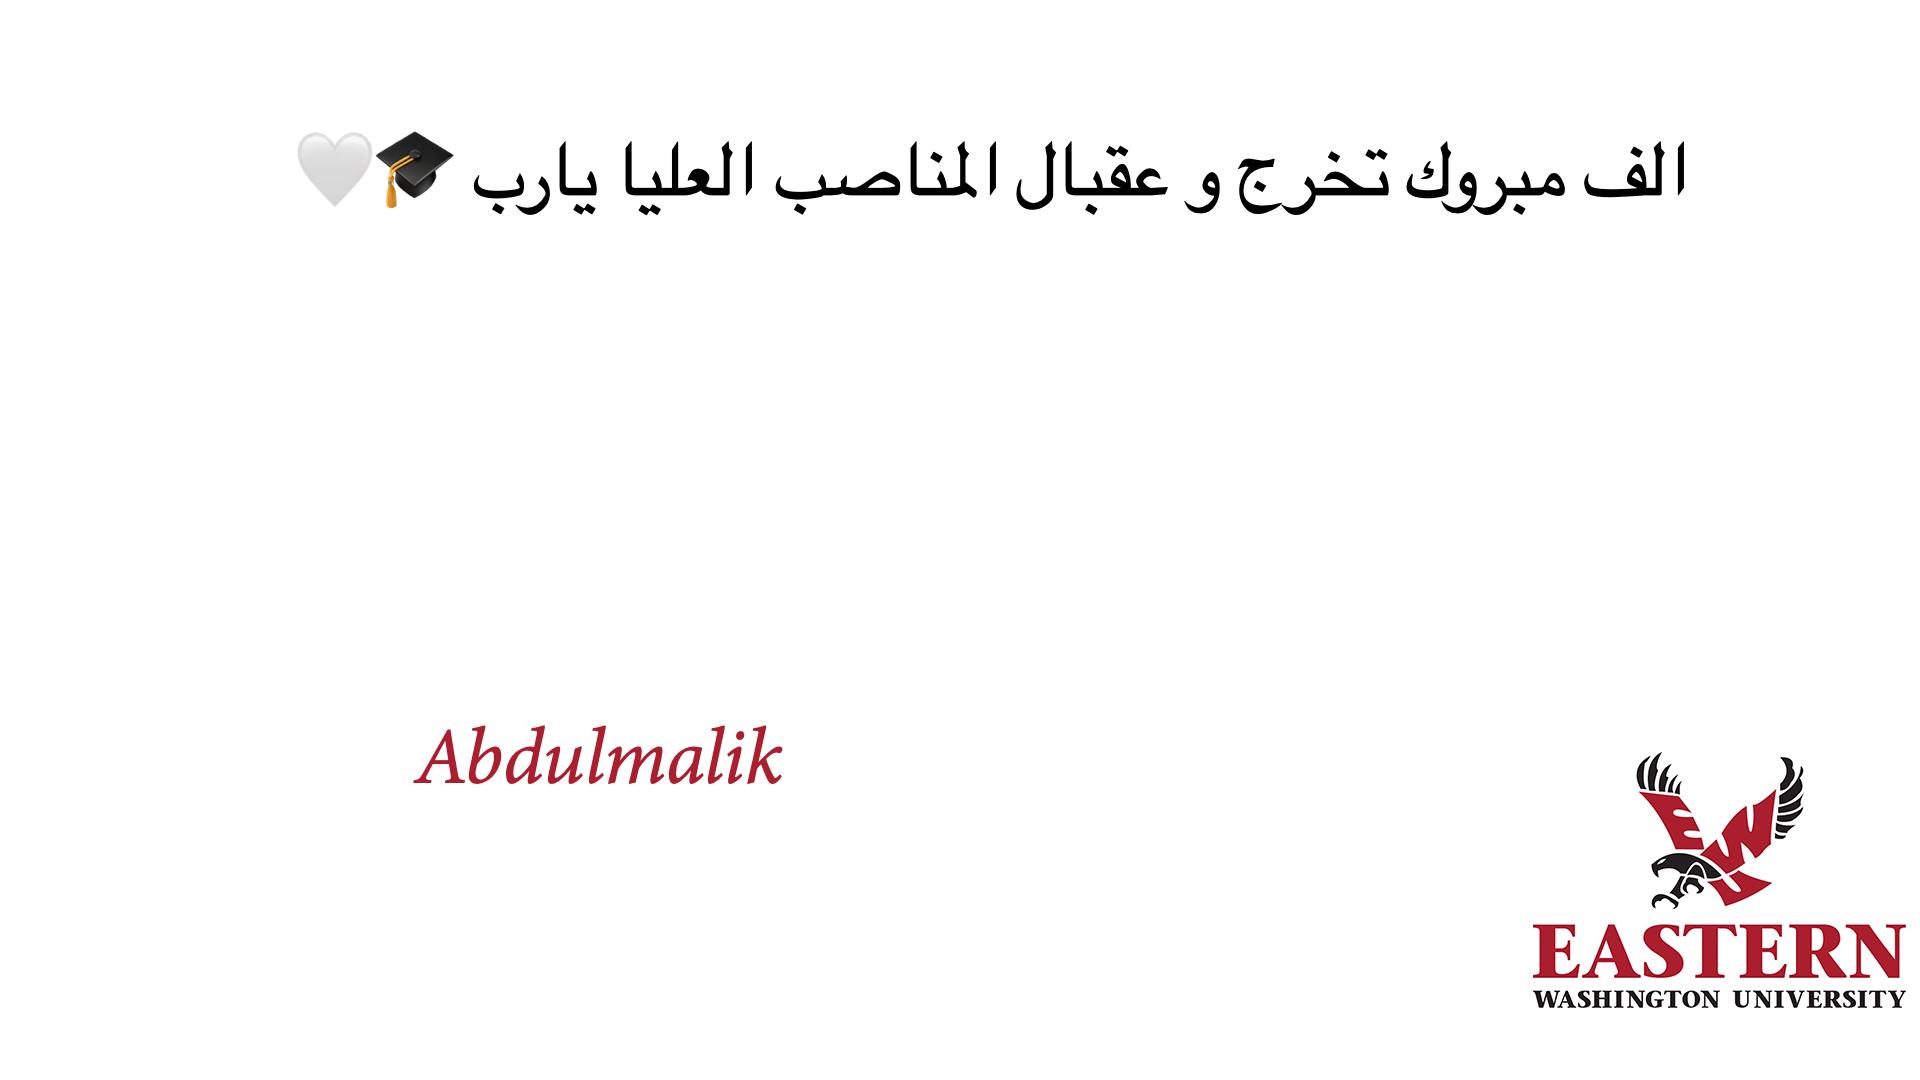 tbi_abdullah-saeed-s-alghamdi_7060.png